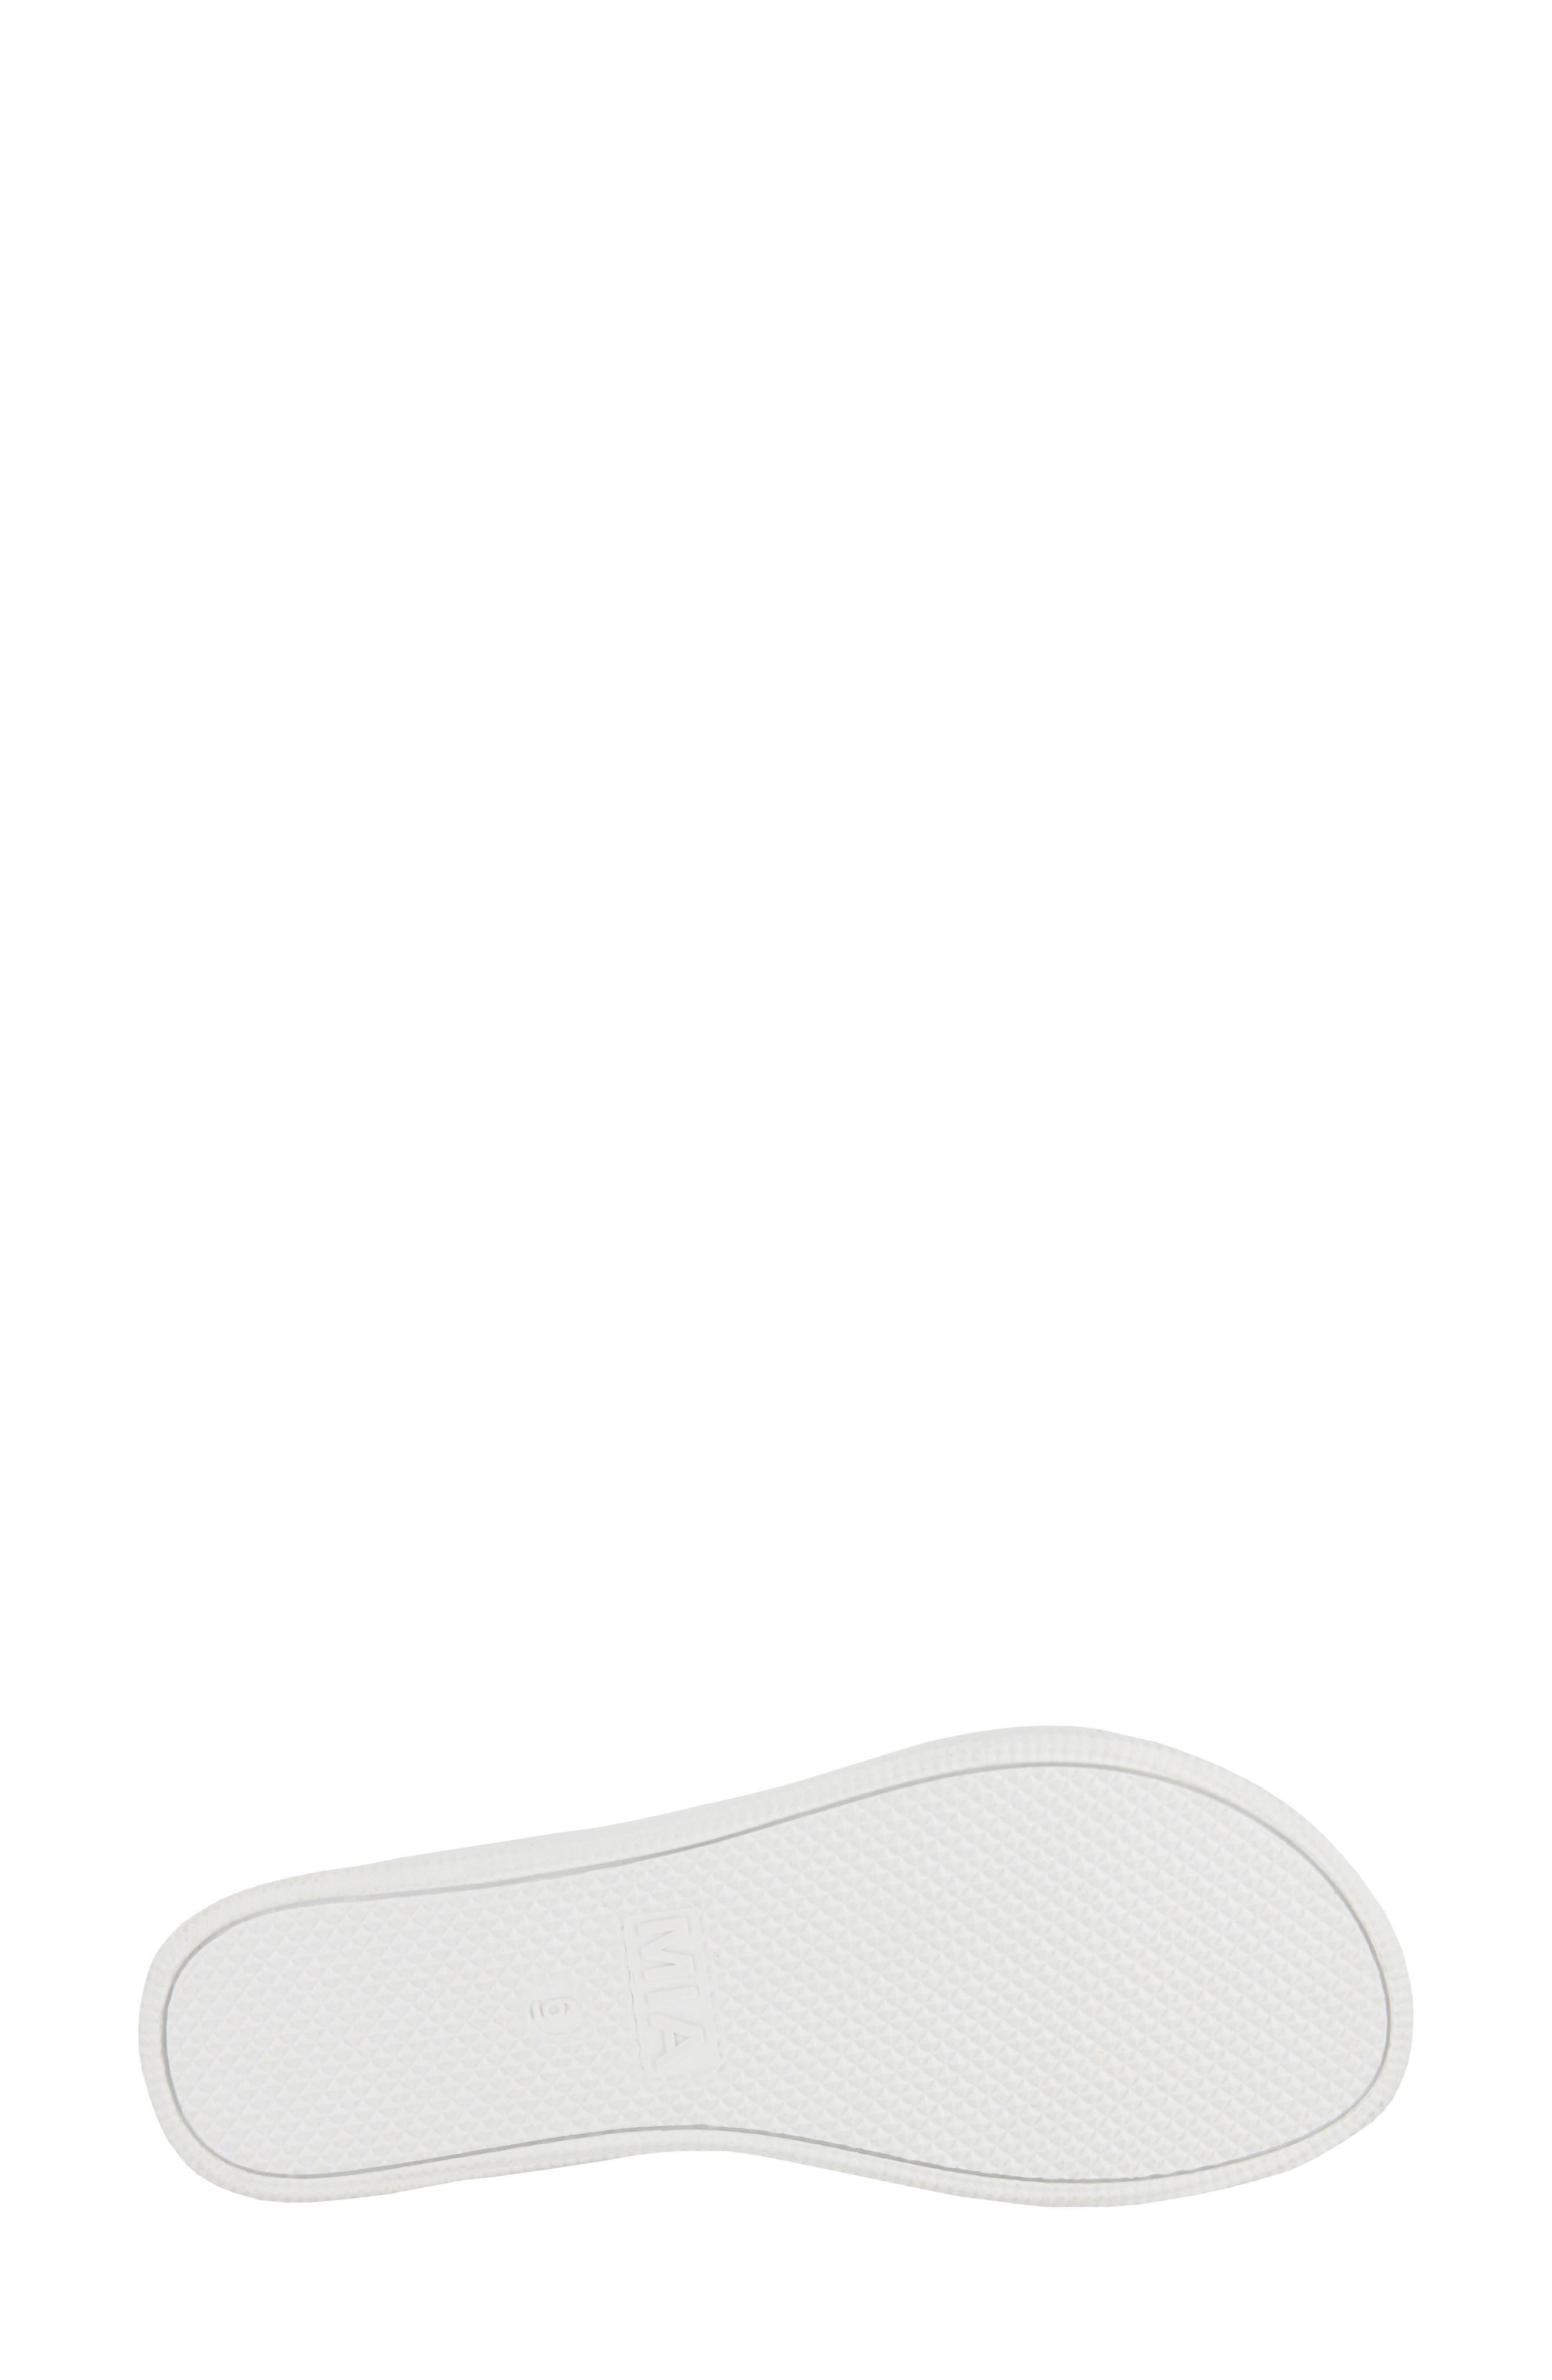 Venessa Platform Slide Sandal,                             Alternate thumbnail 6, color,                             Rose Gold Faux Leather